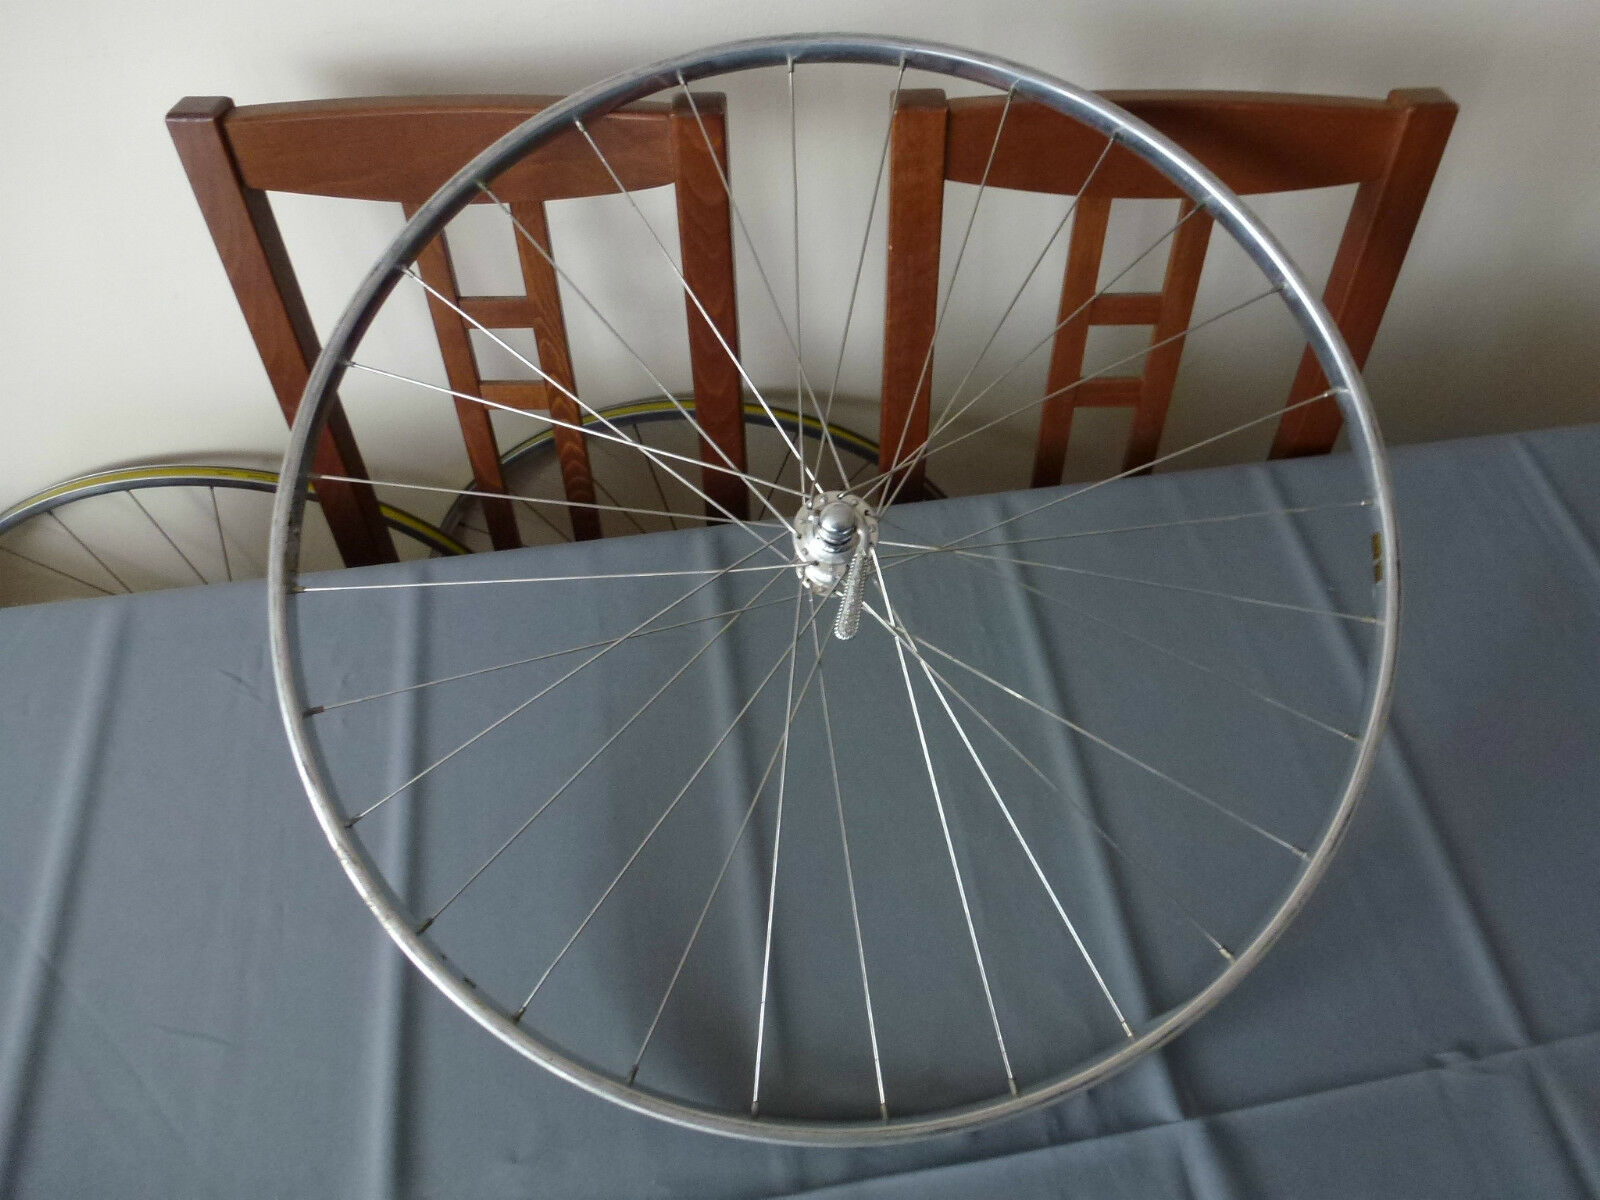 Vintage Campagnolo Nuovo Record front hub & Scheeren  rim , wheel , pista  shop clearance